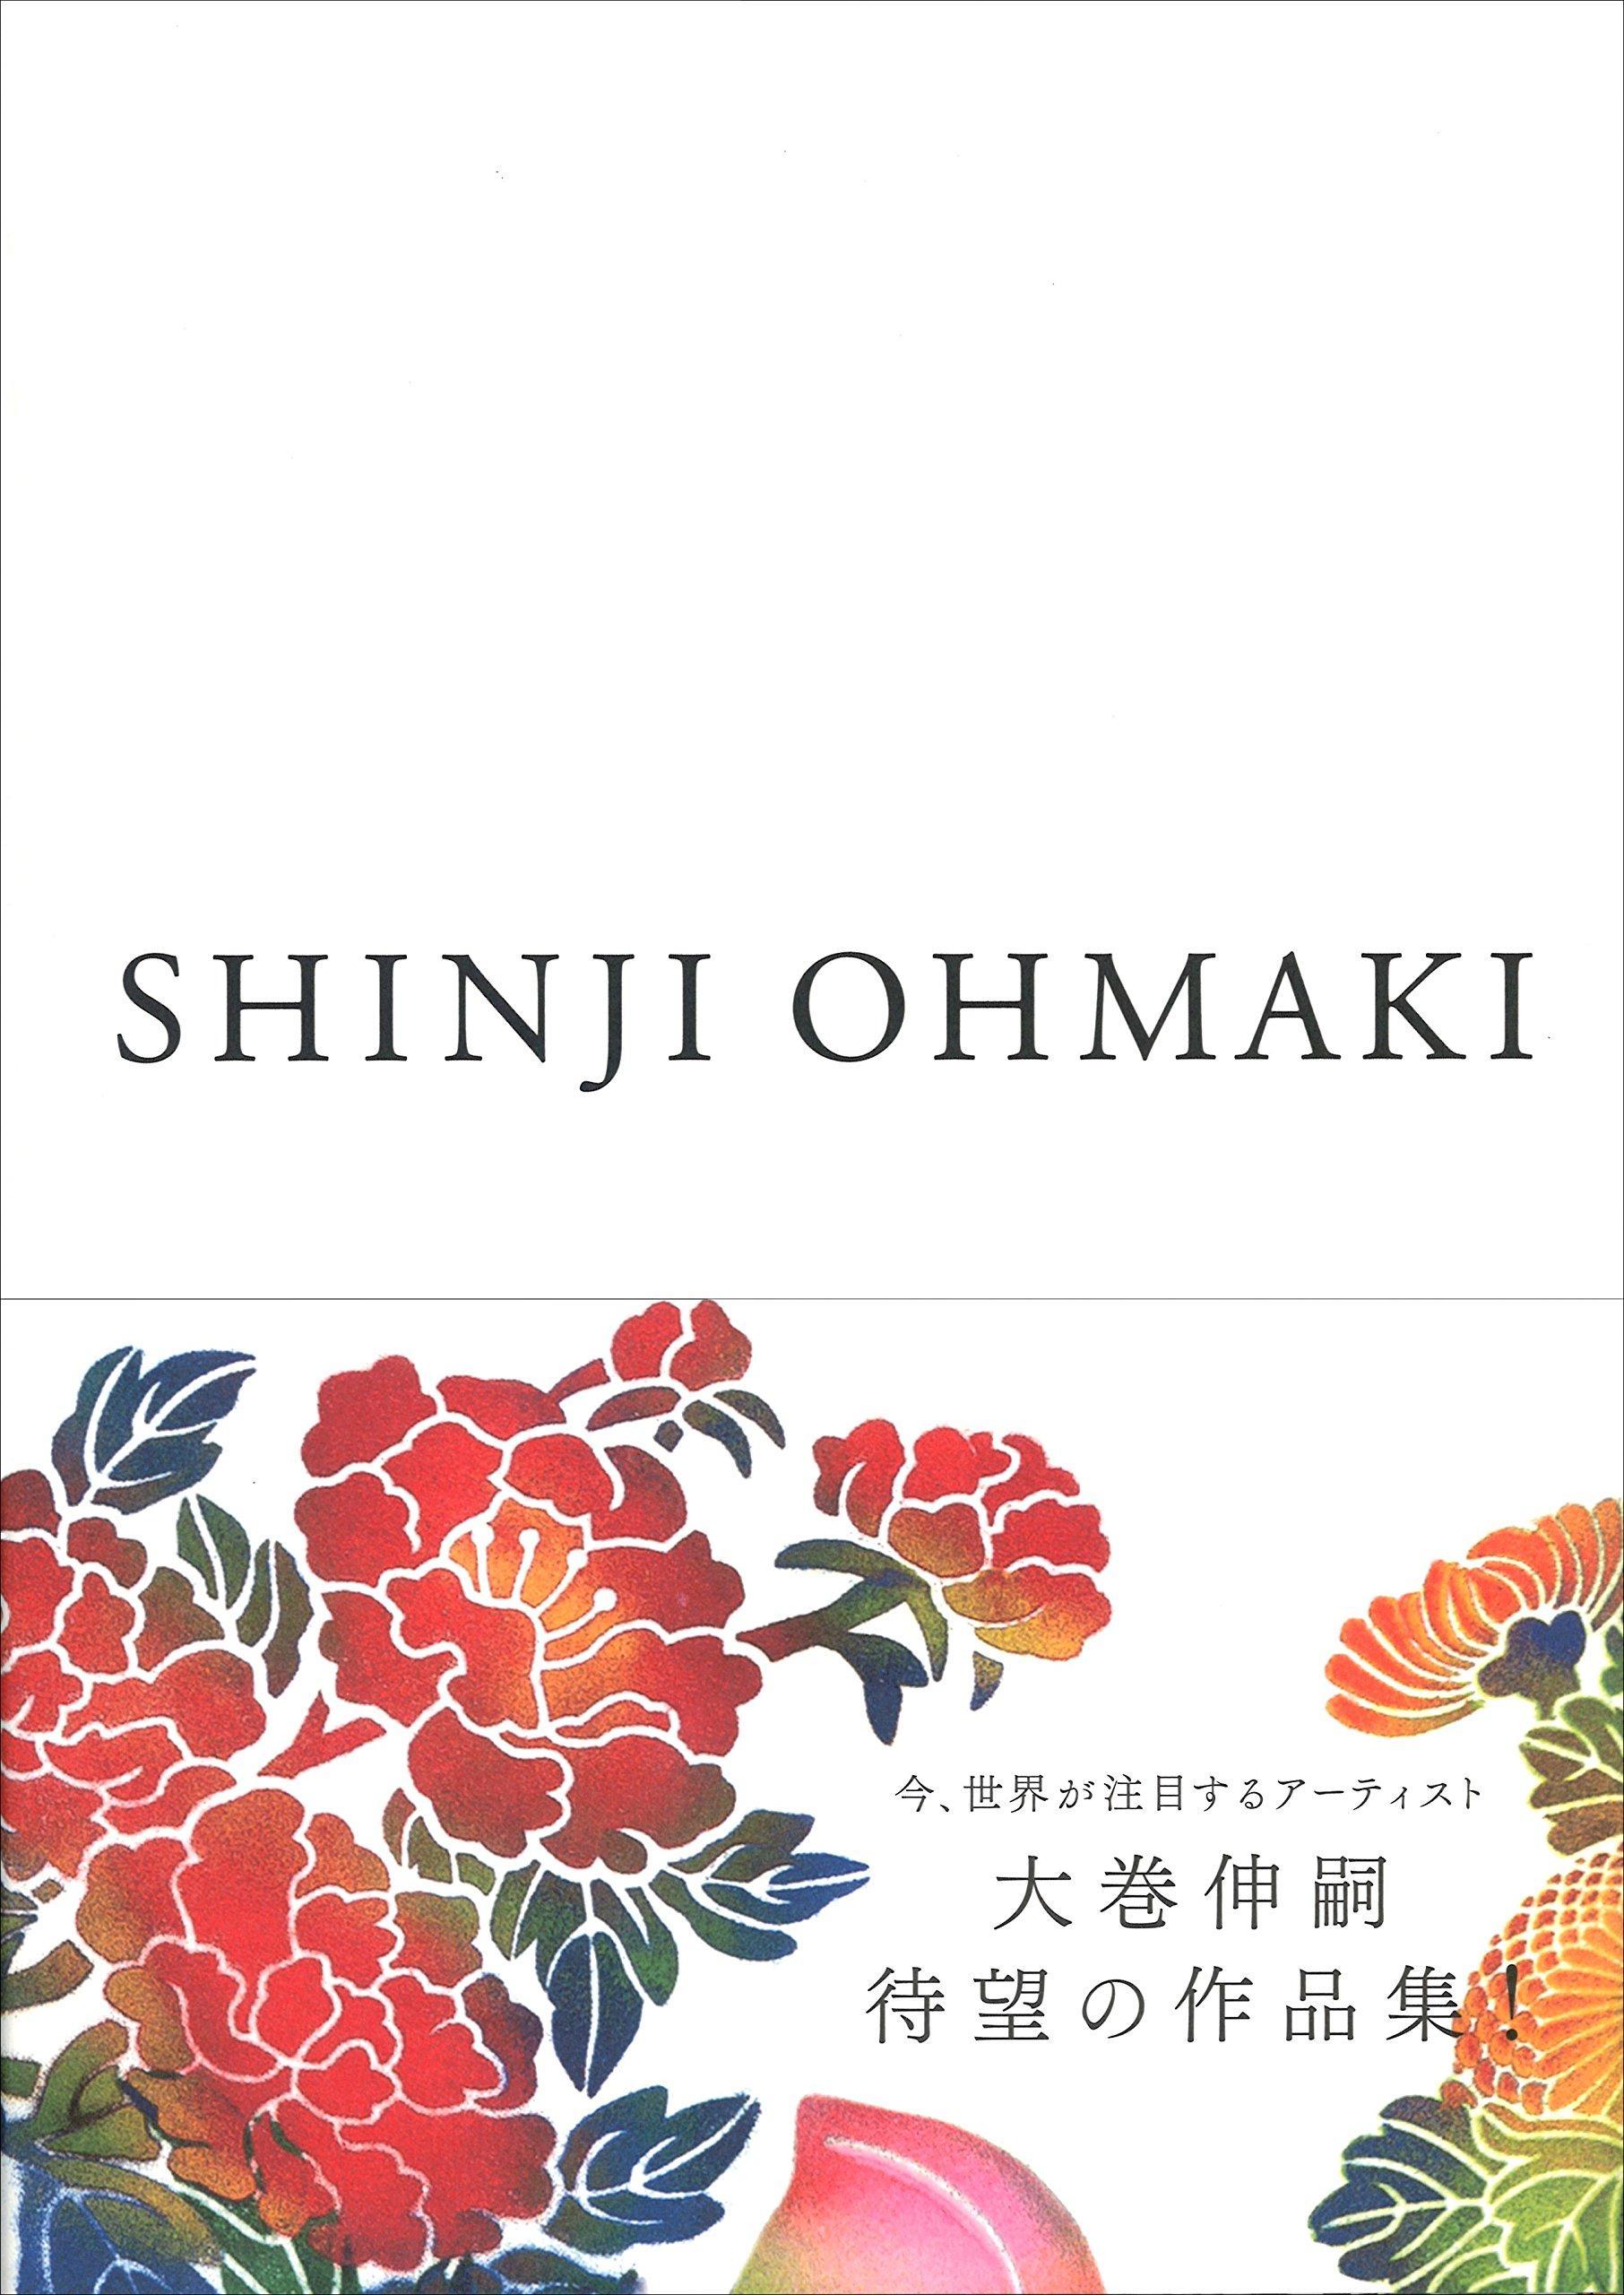 SHINJI OHMAKI